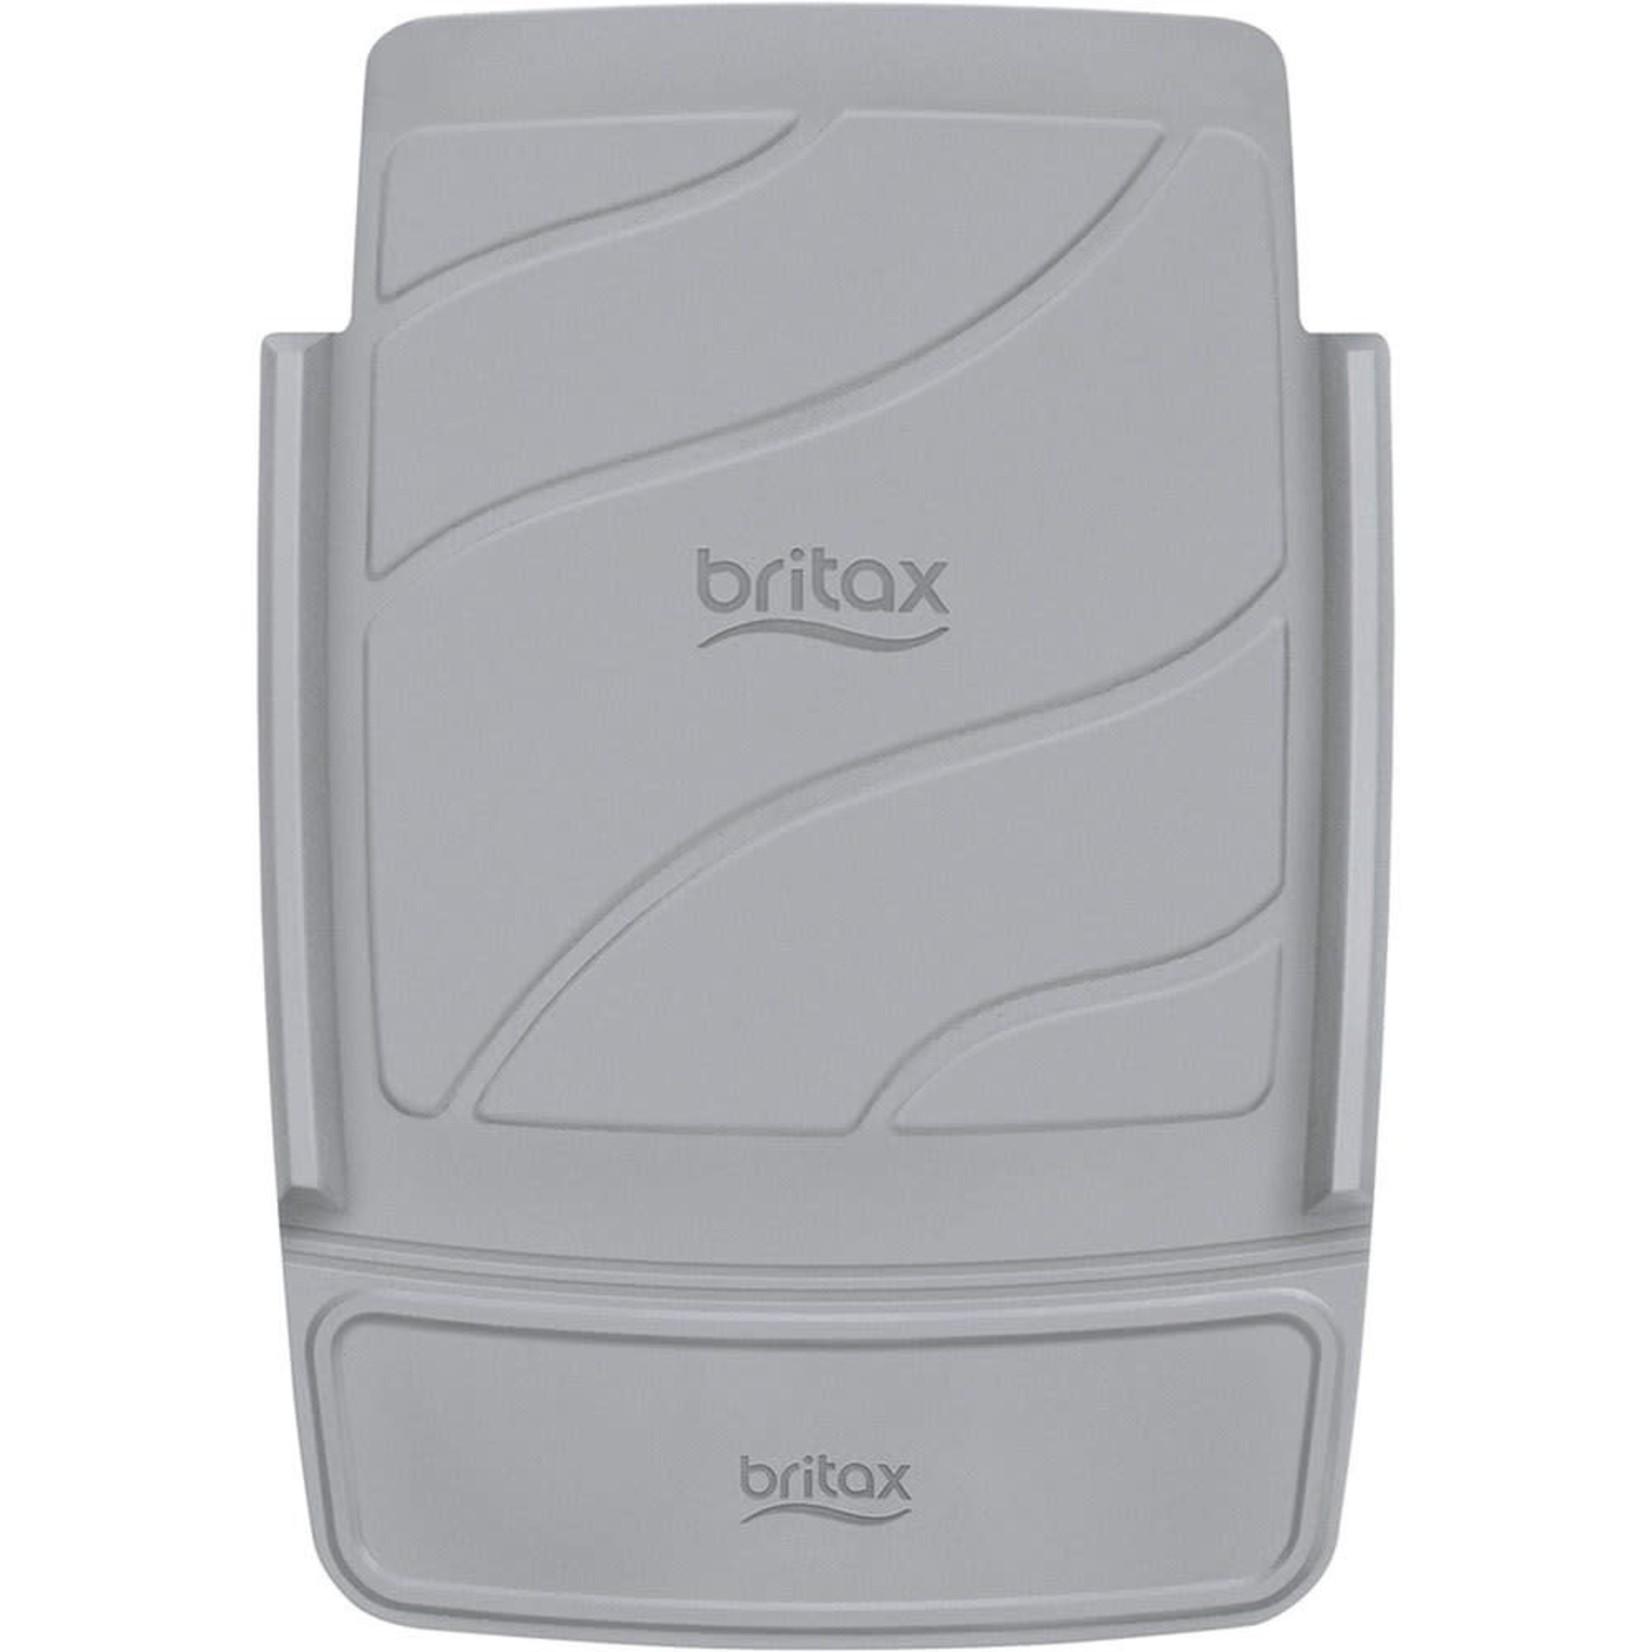 Britax Römer Vehicle Seat Protector